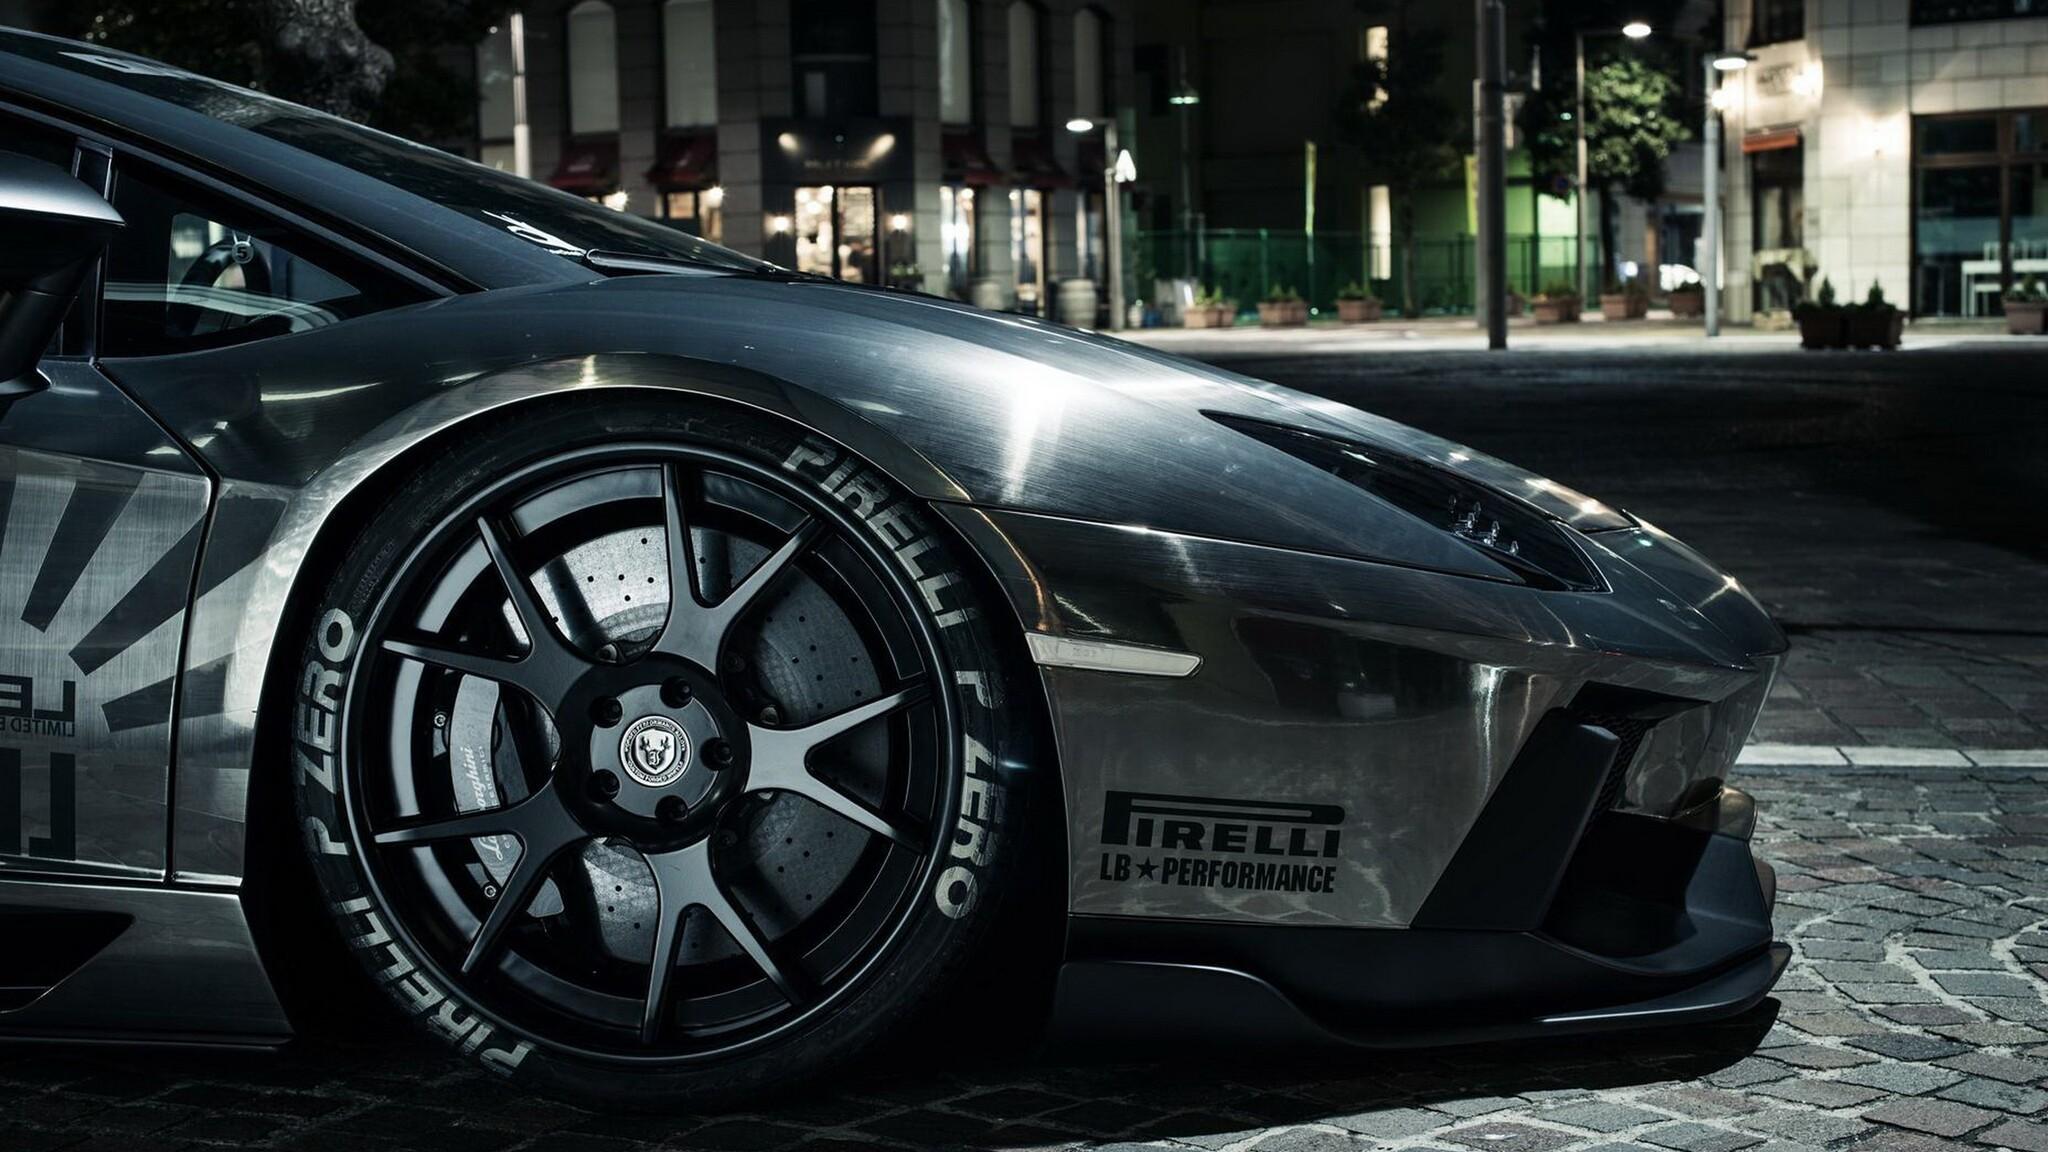 2048x1152 Lamborghini Aventador Pirelli Tyres 2048x1152